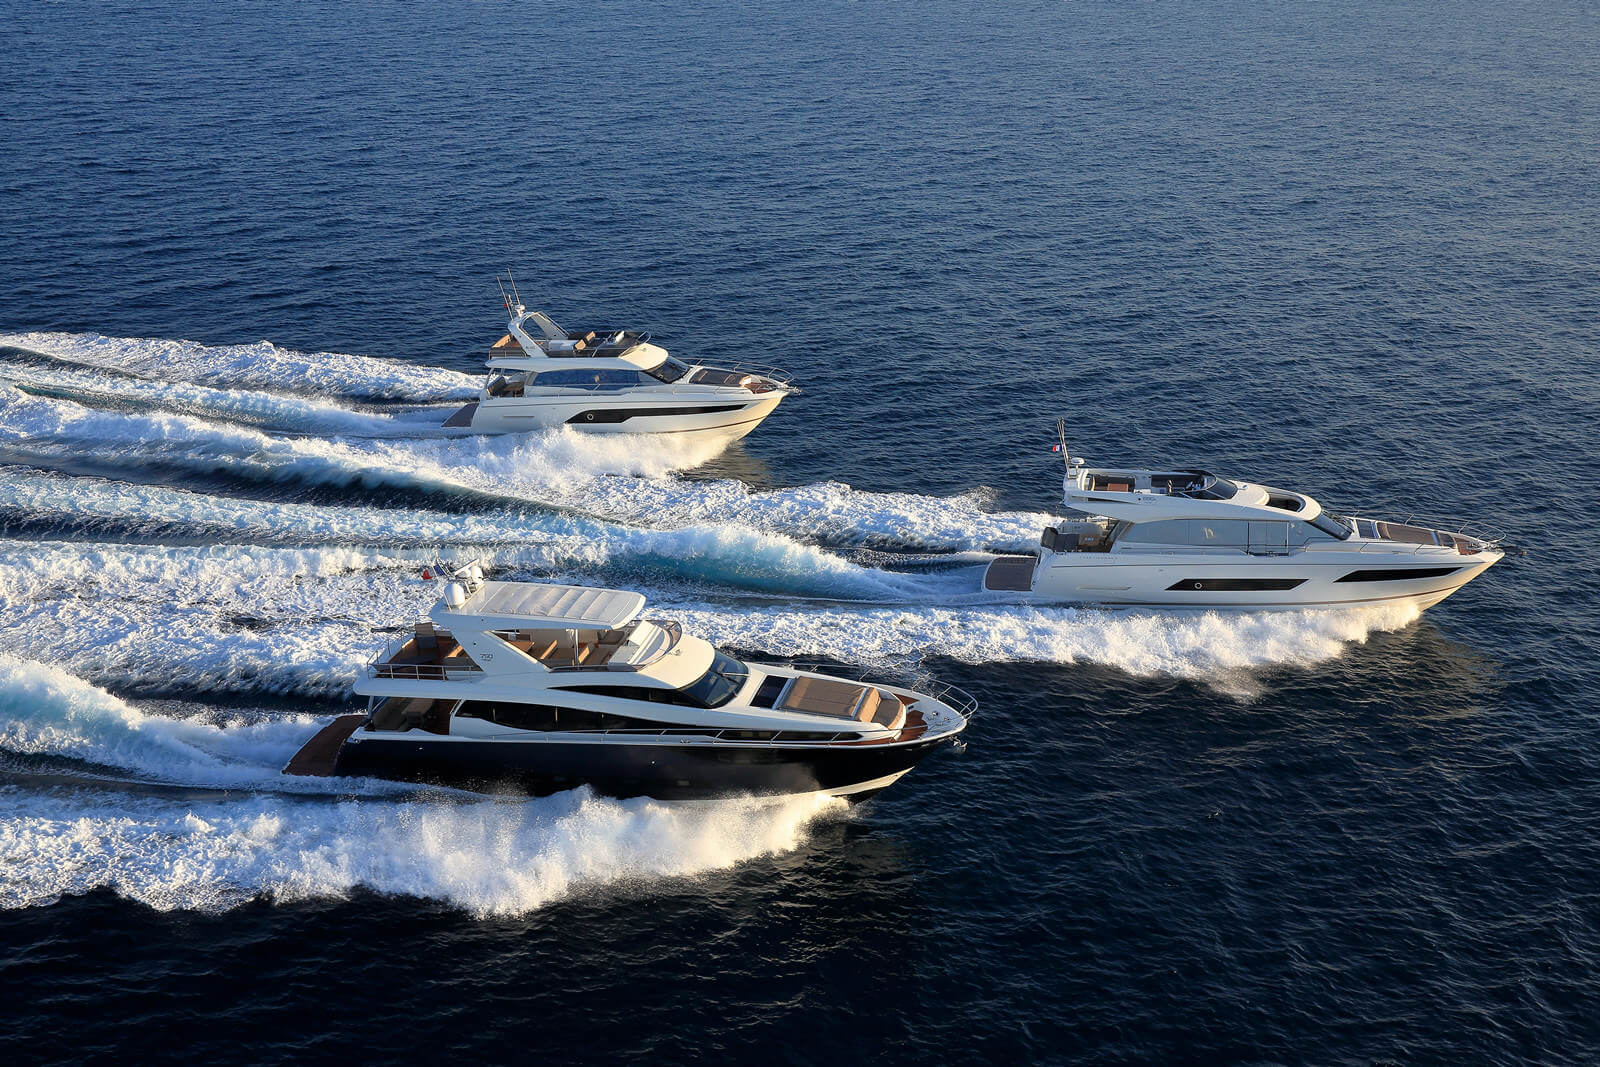 Used yachts & boats - Stream Yachts